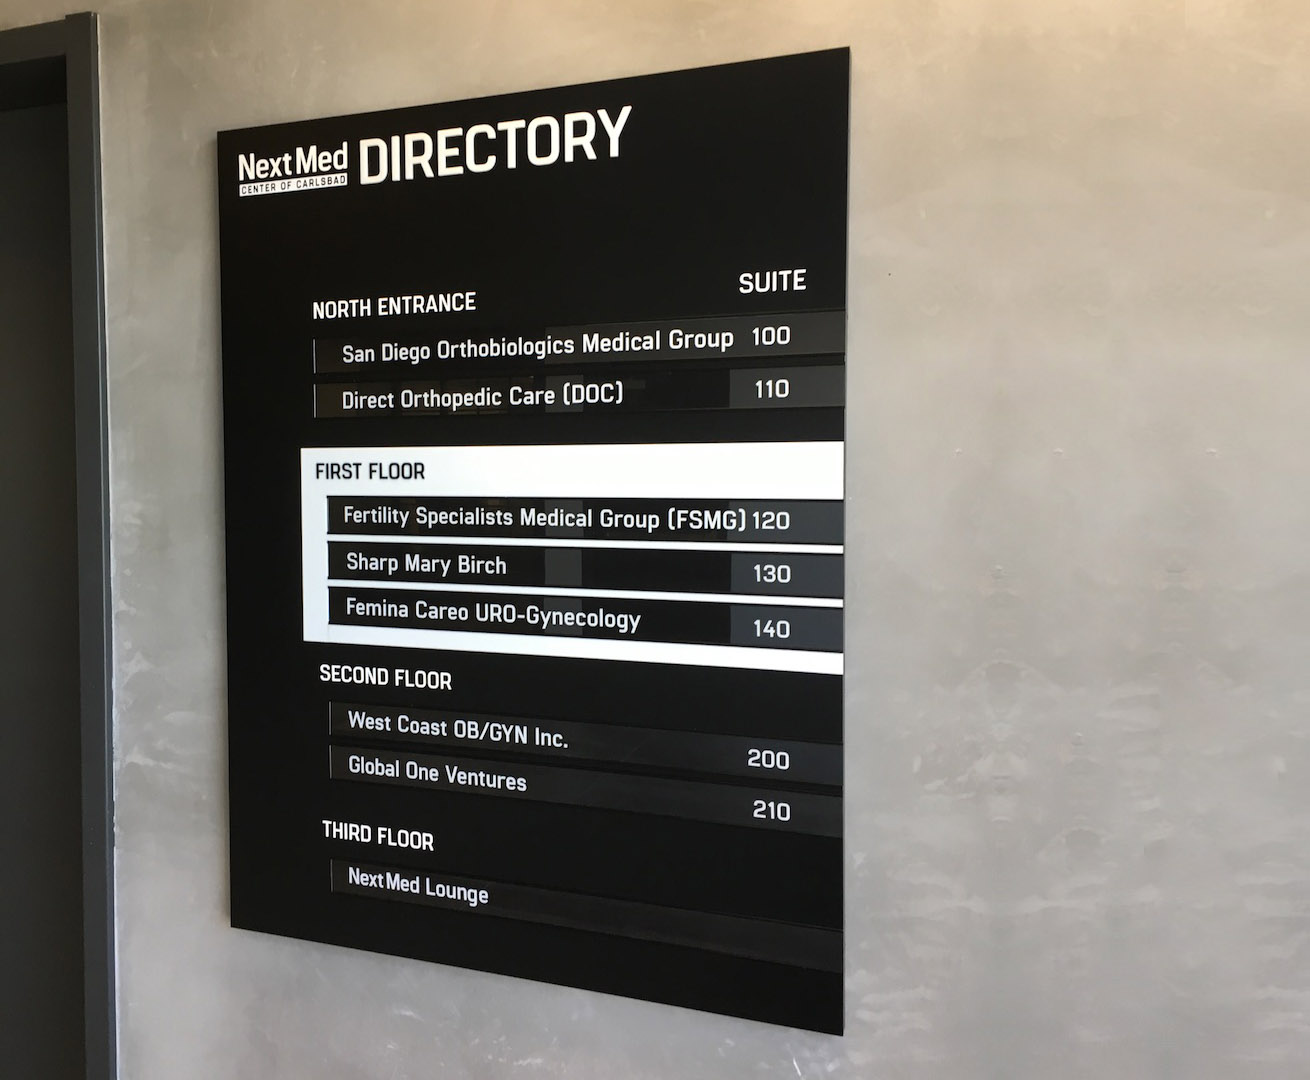 NextMed Center branded Directory